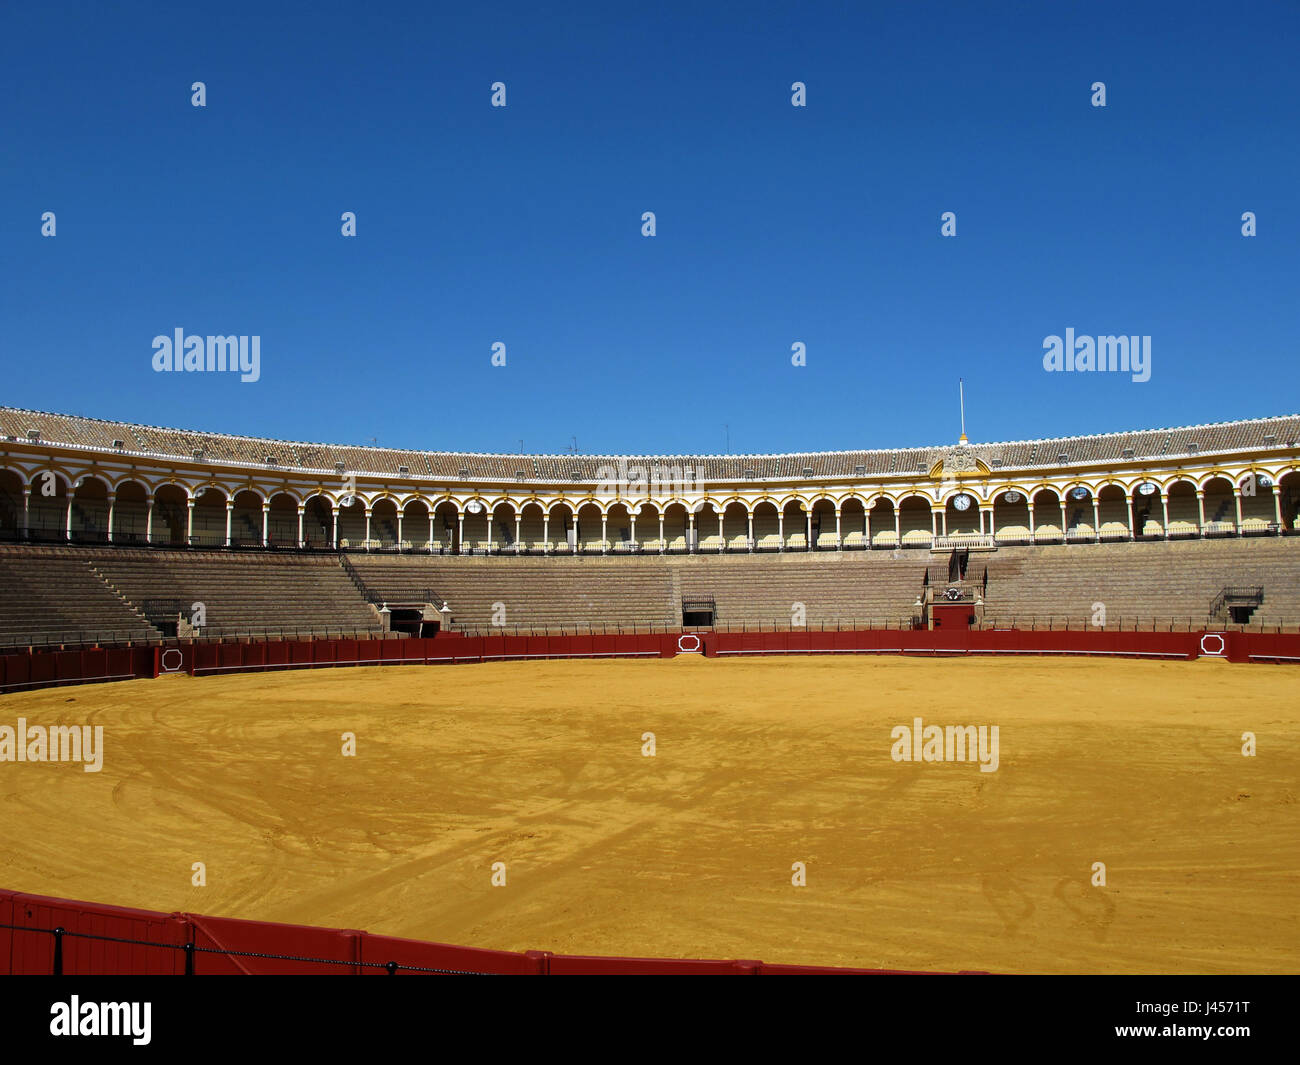 Plaza de Toros de la Real Maestranza de Caballeria de Seville, bullfight arena, Andalusia, Seville province, Spain, - Stock Image